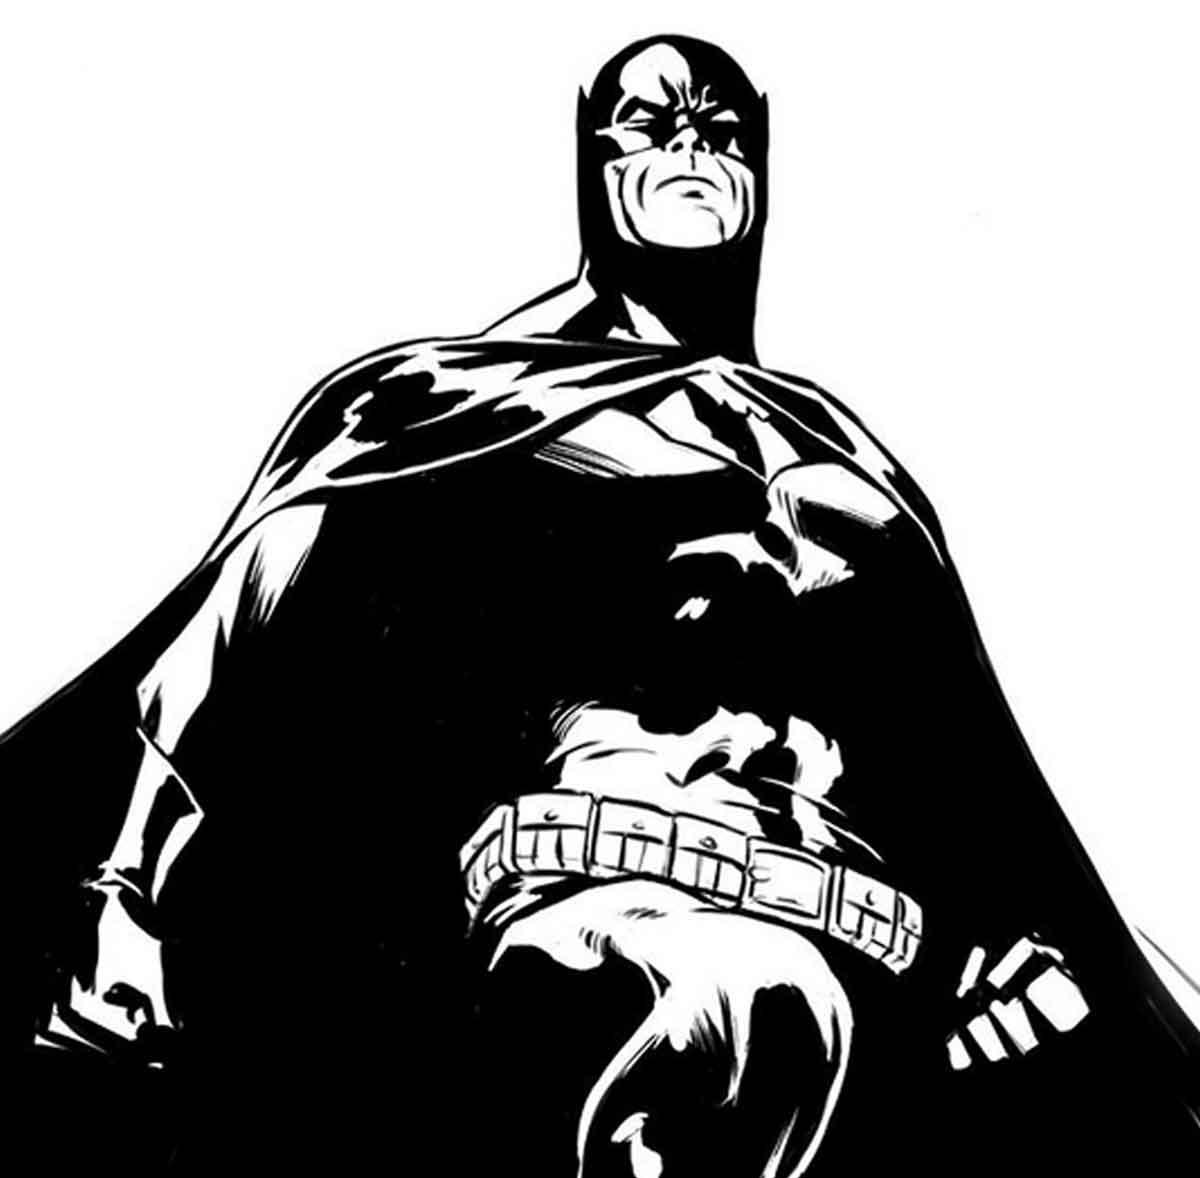 El jefe de Marvel comparte una espectacular imagen de Batman